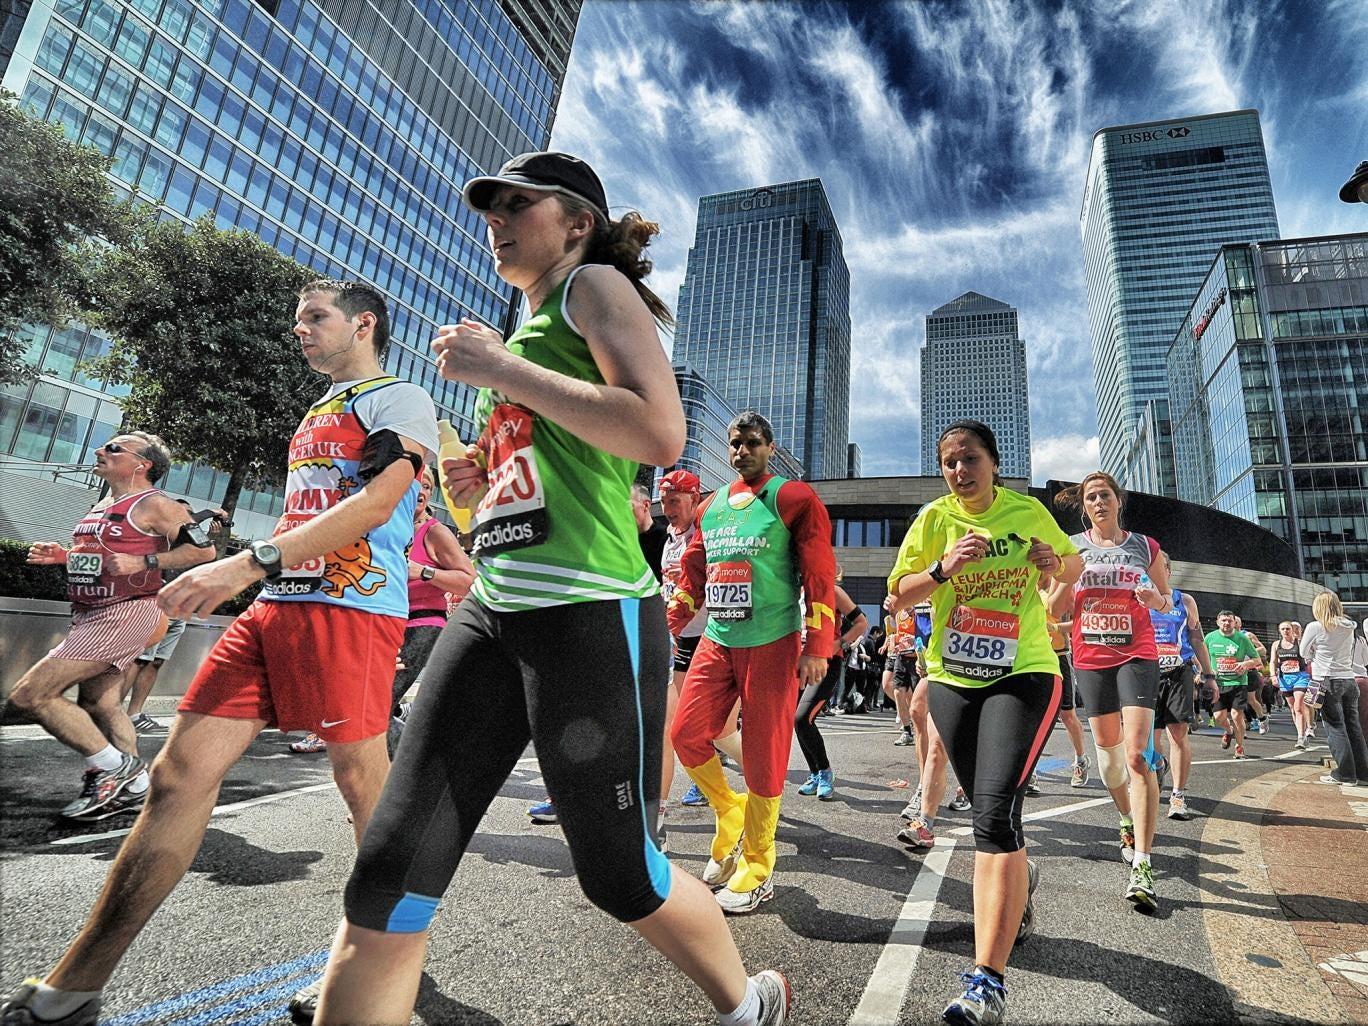 Runners reach the nineteen mile mark of the London Marathon